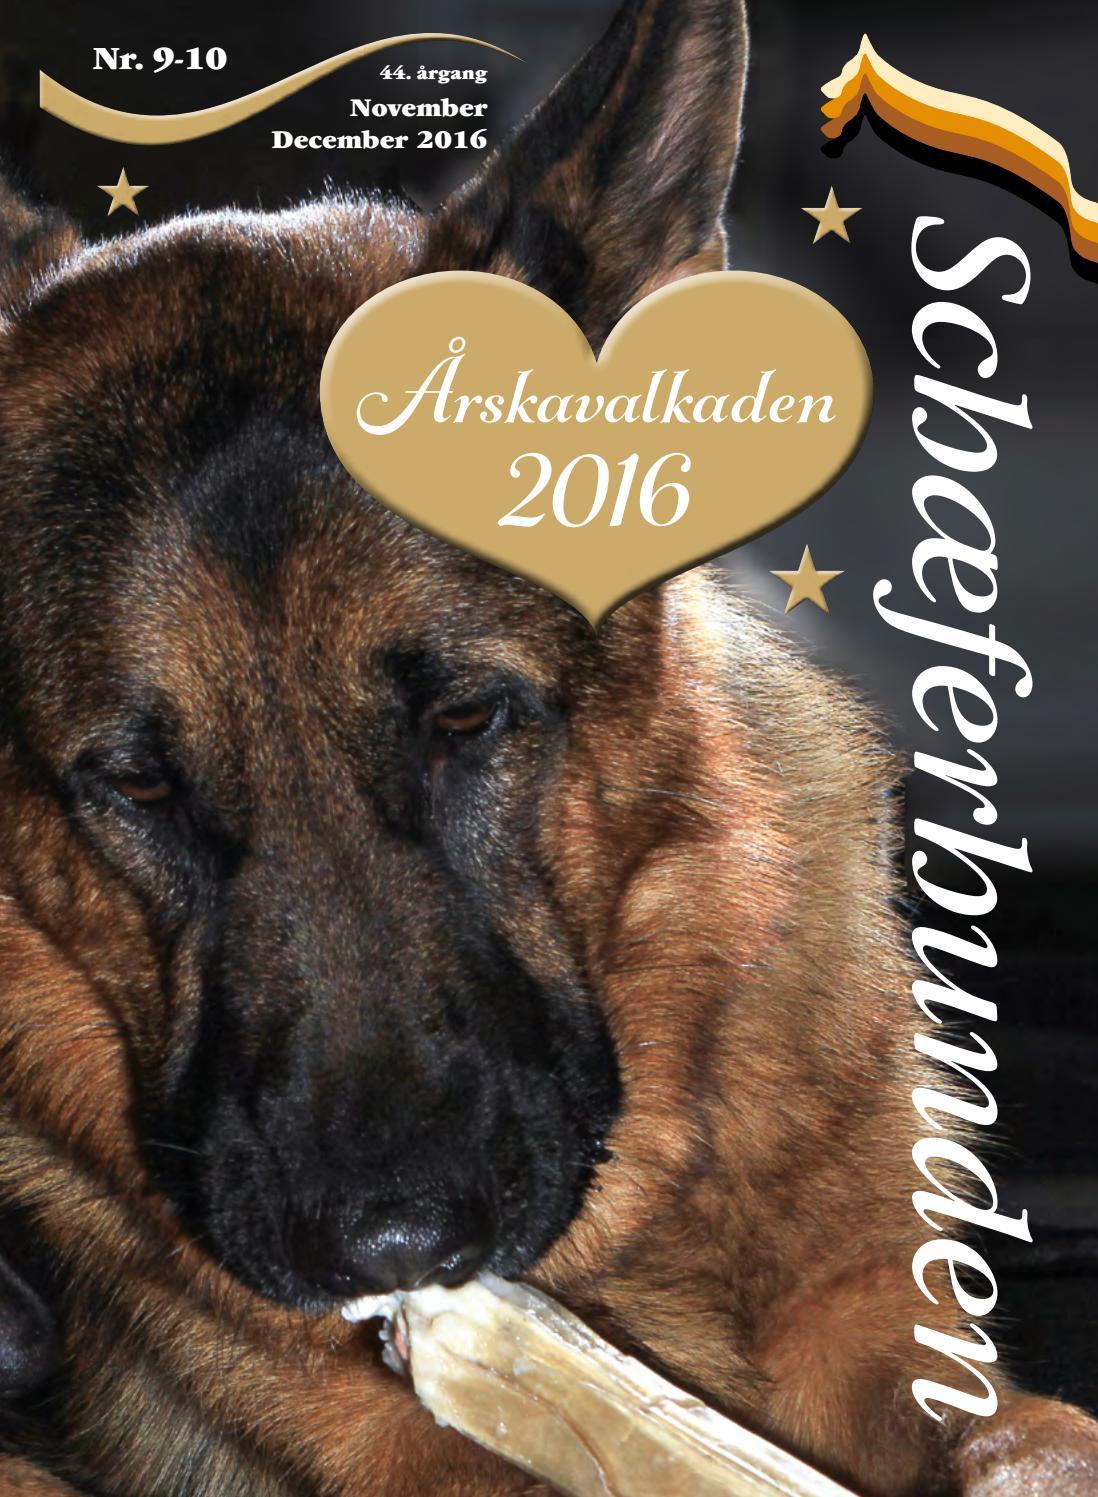 Picture of: Schaeferhunden Nr 9 10 Web By Randi Salzwedell Issuu